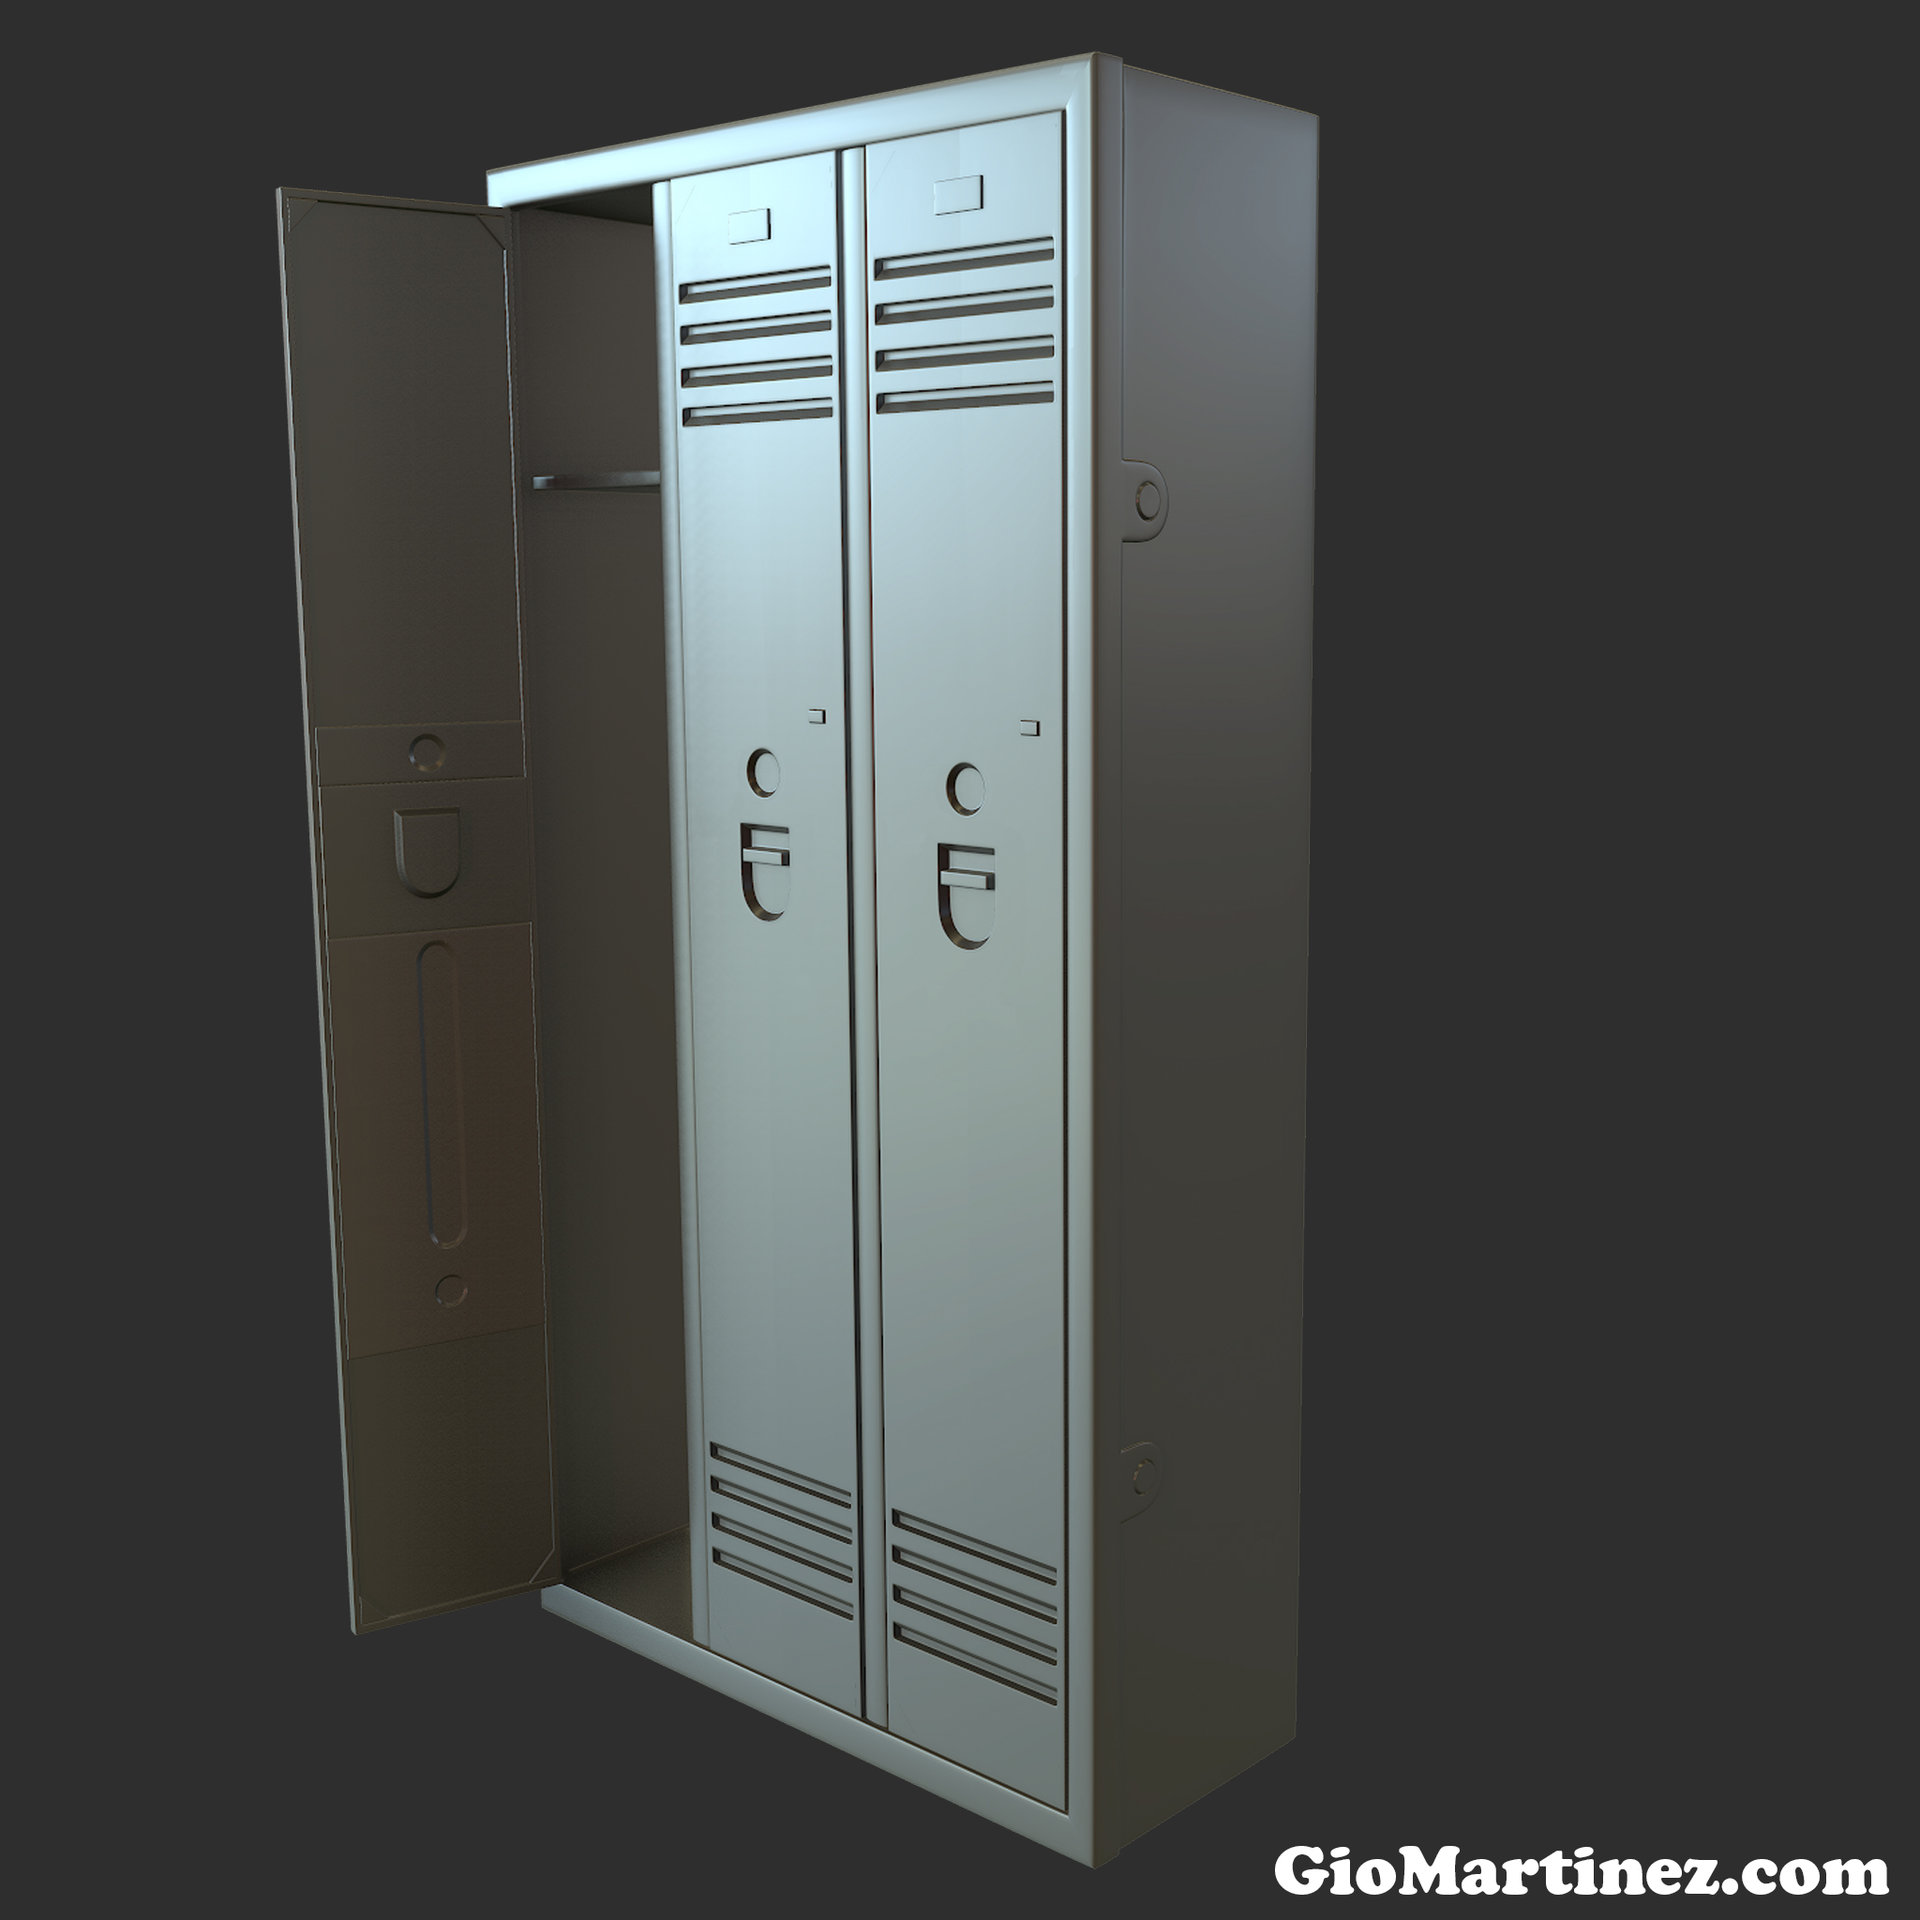 giovanni-martinez-locker-hi-rez.jpg?1429762445